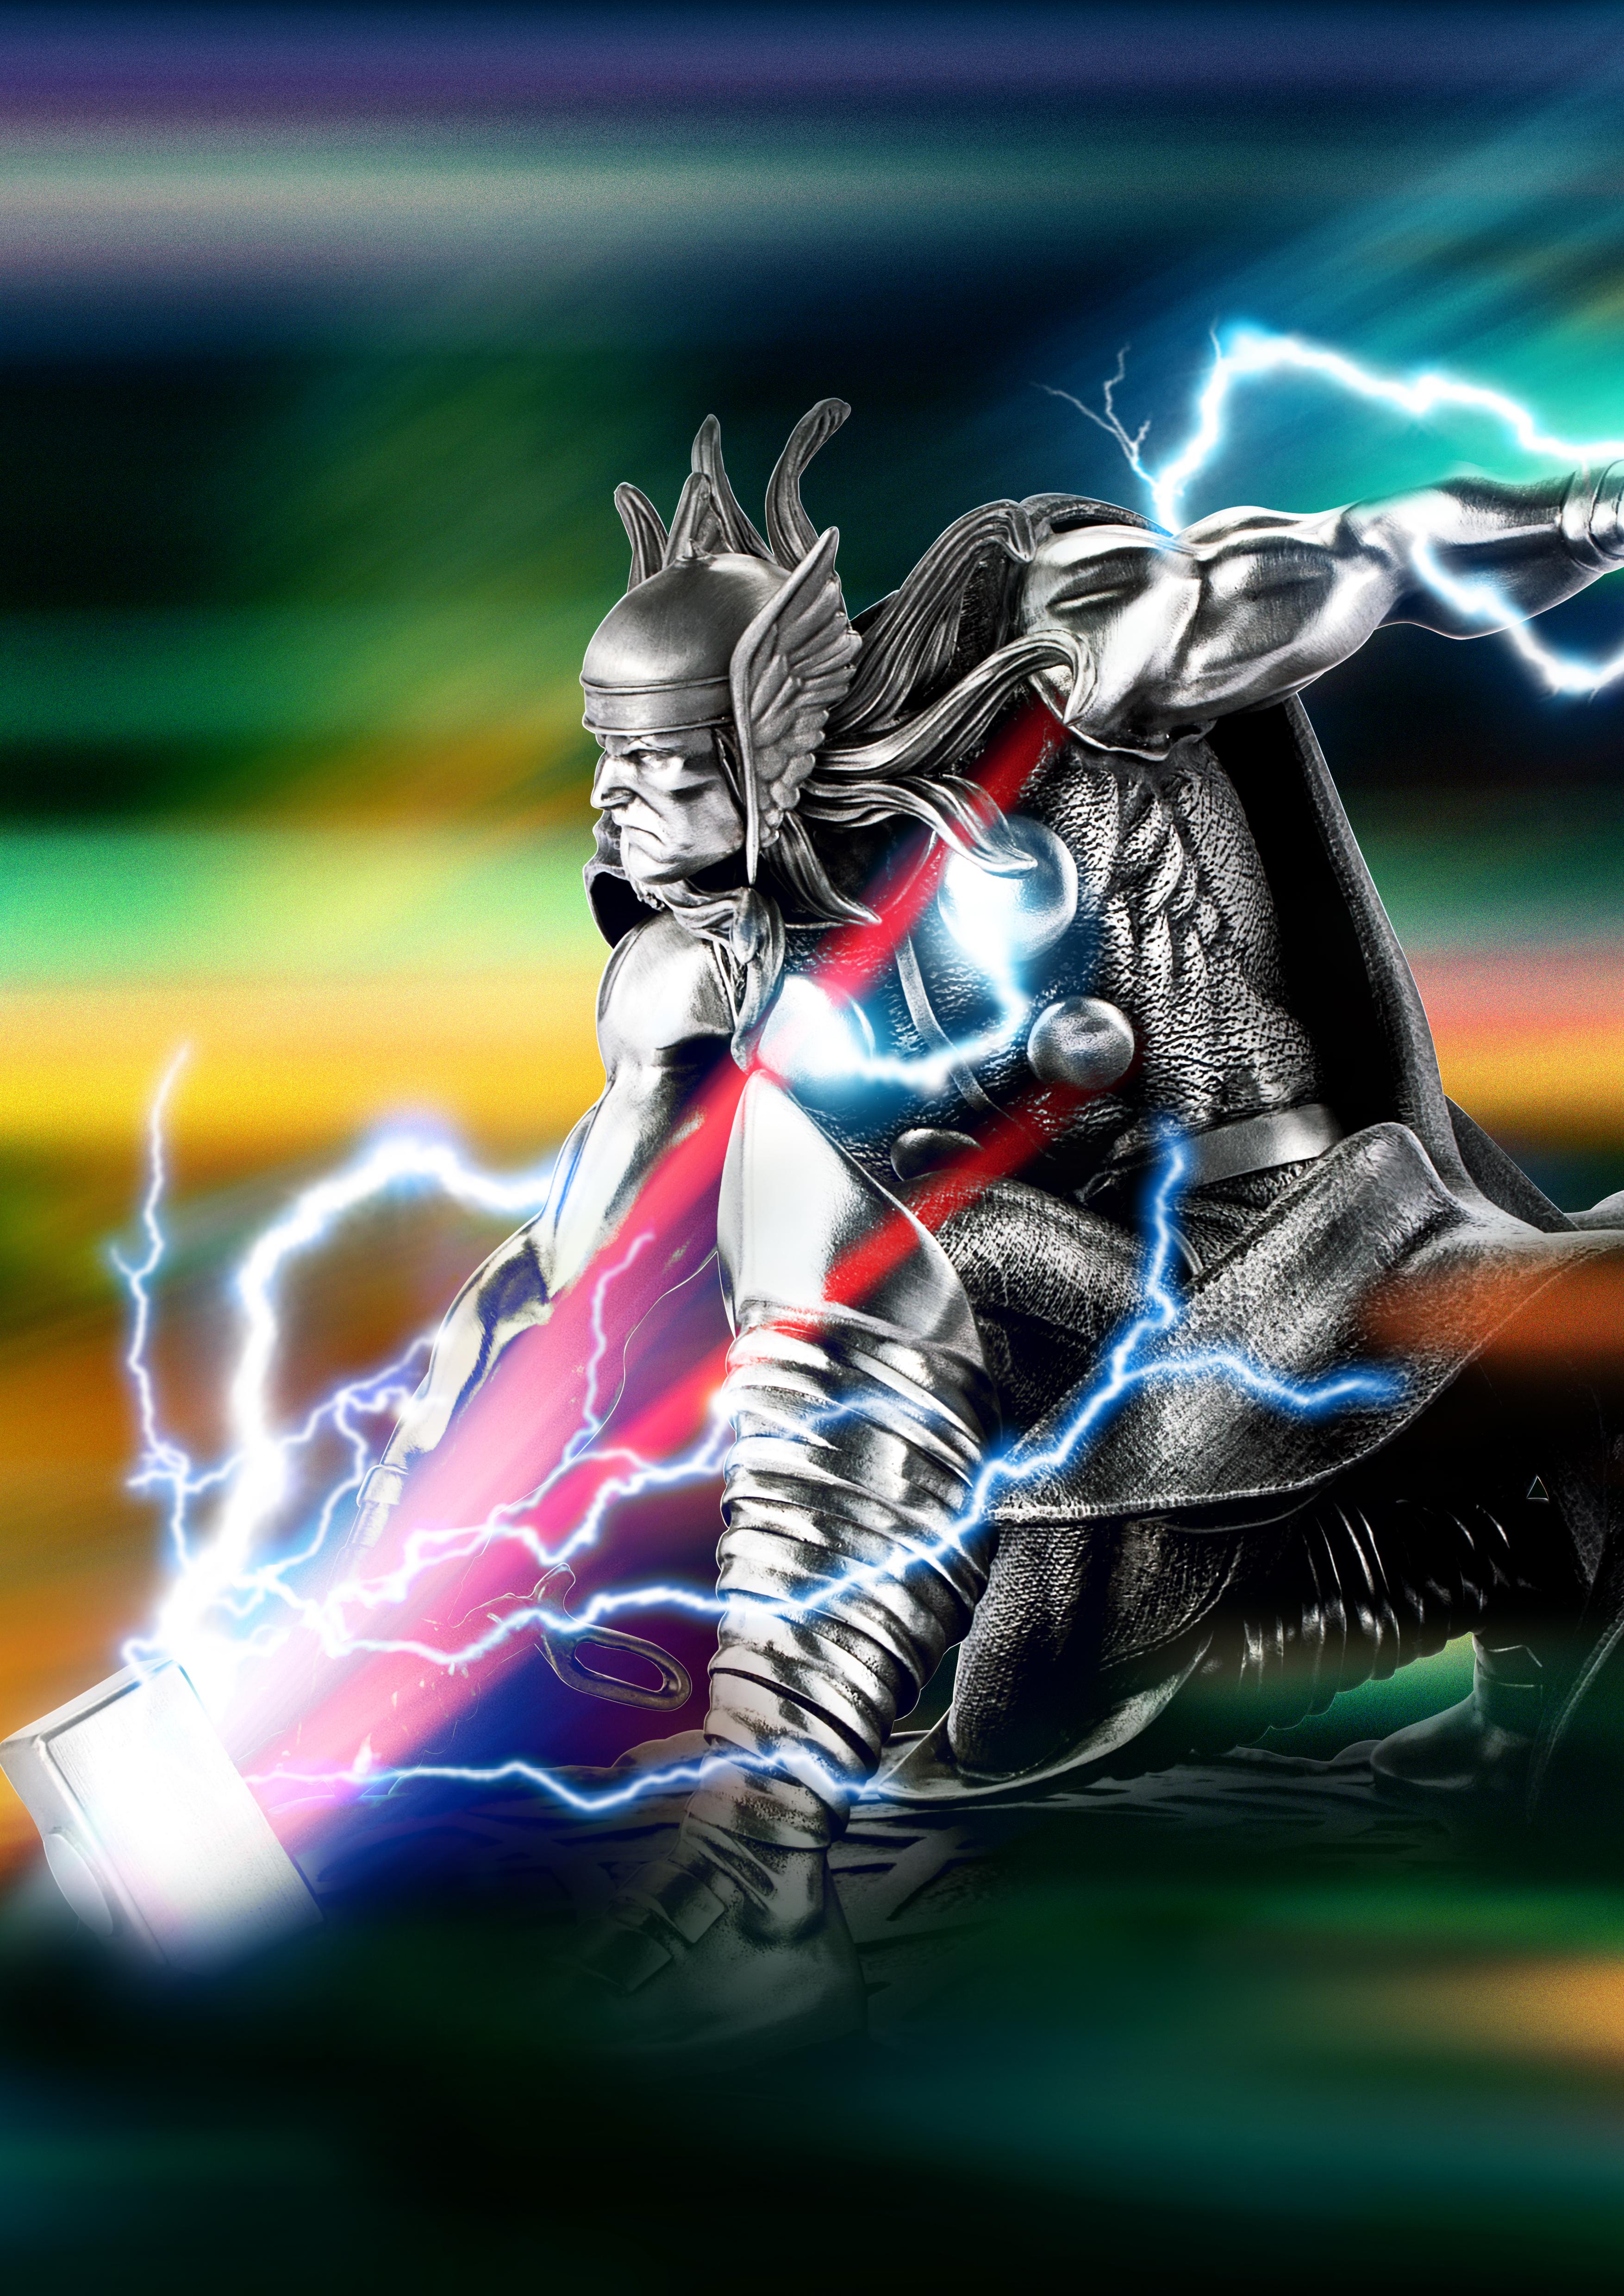 limited-edition-thor-god-of-thunder-figurine